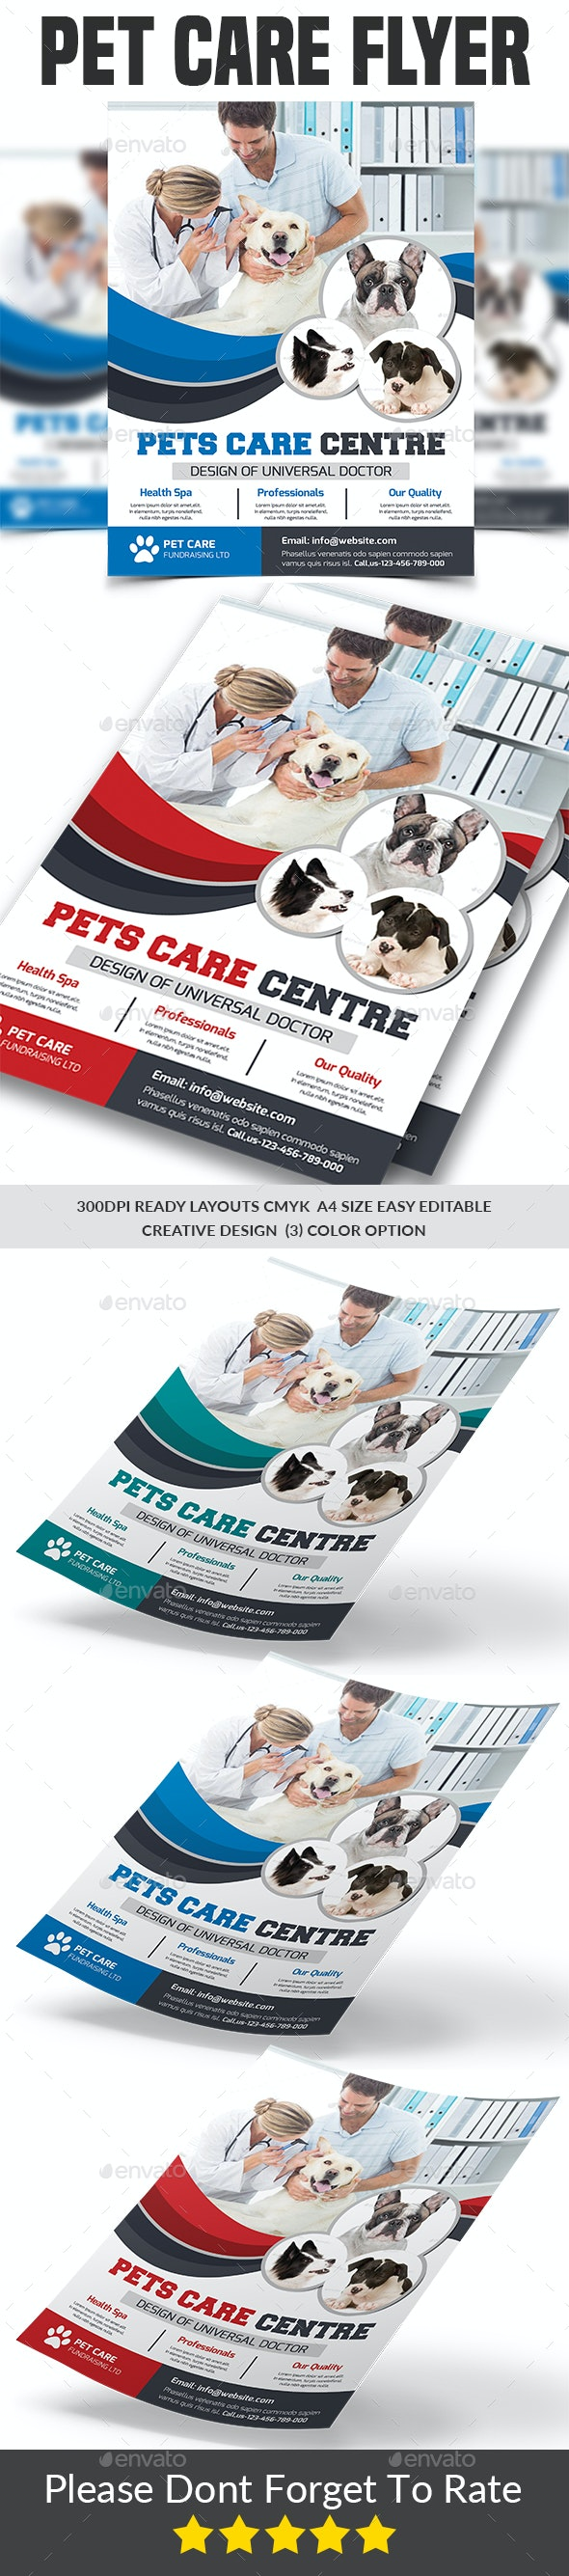 Pet Care Flyer Templates - Corporate Flyers